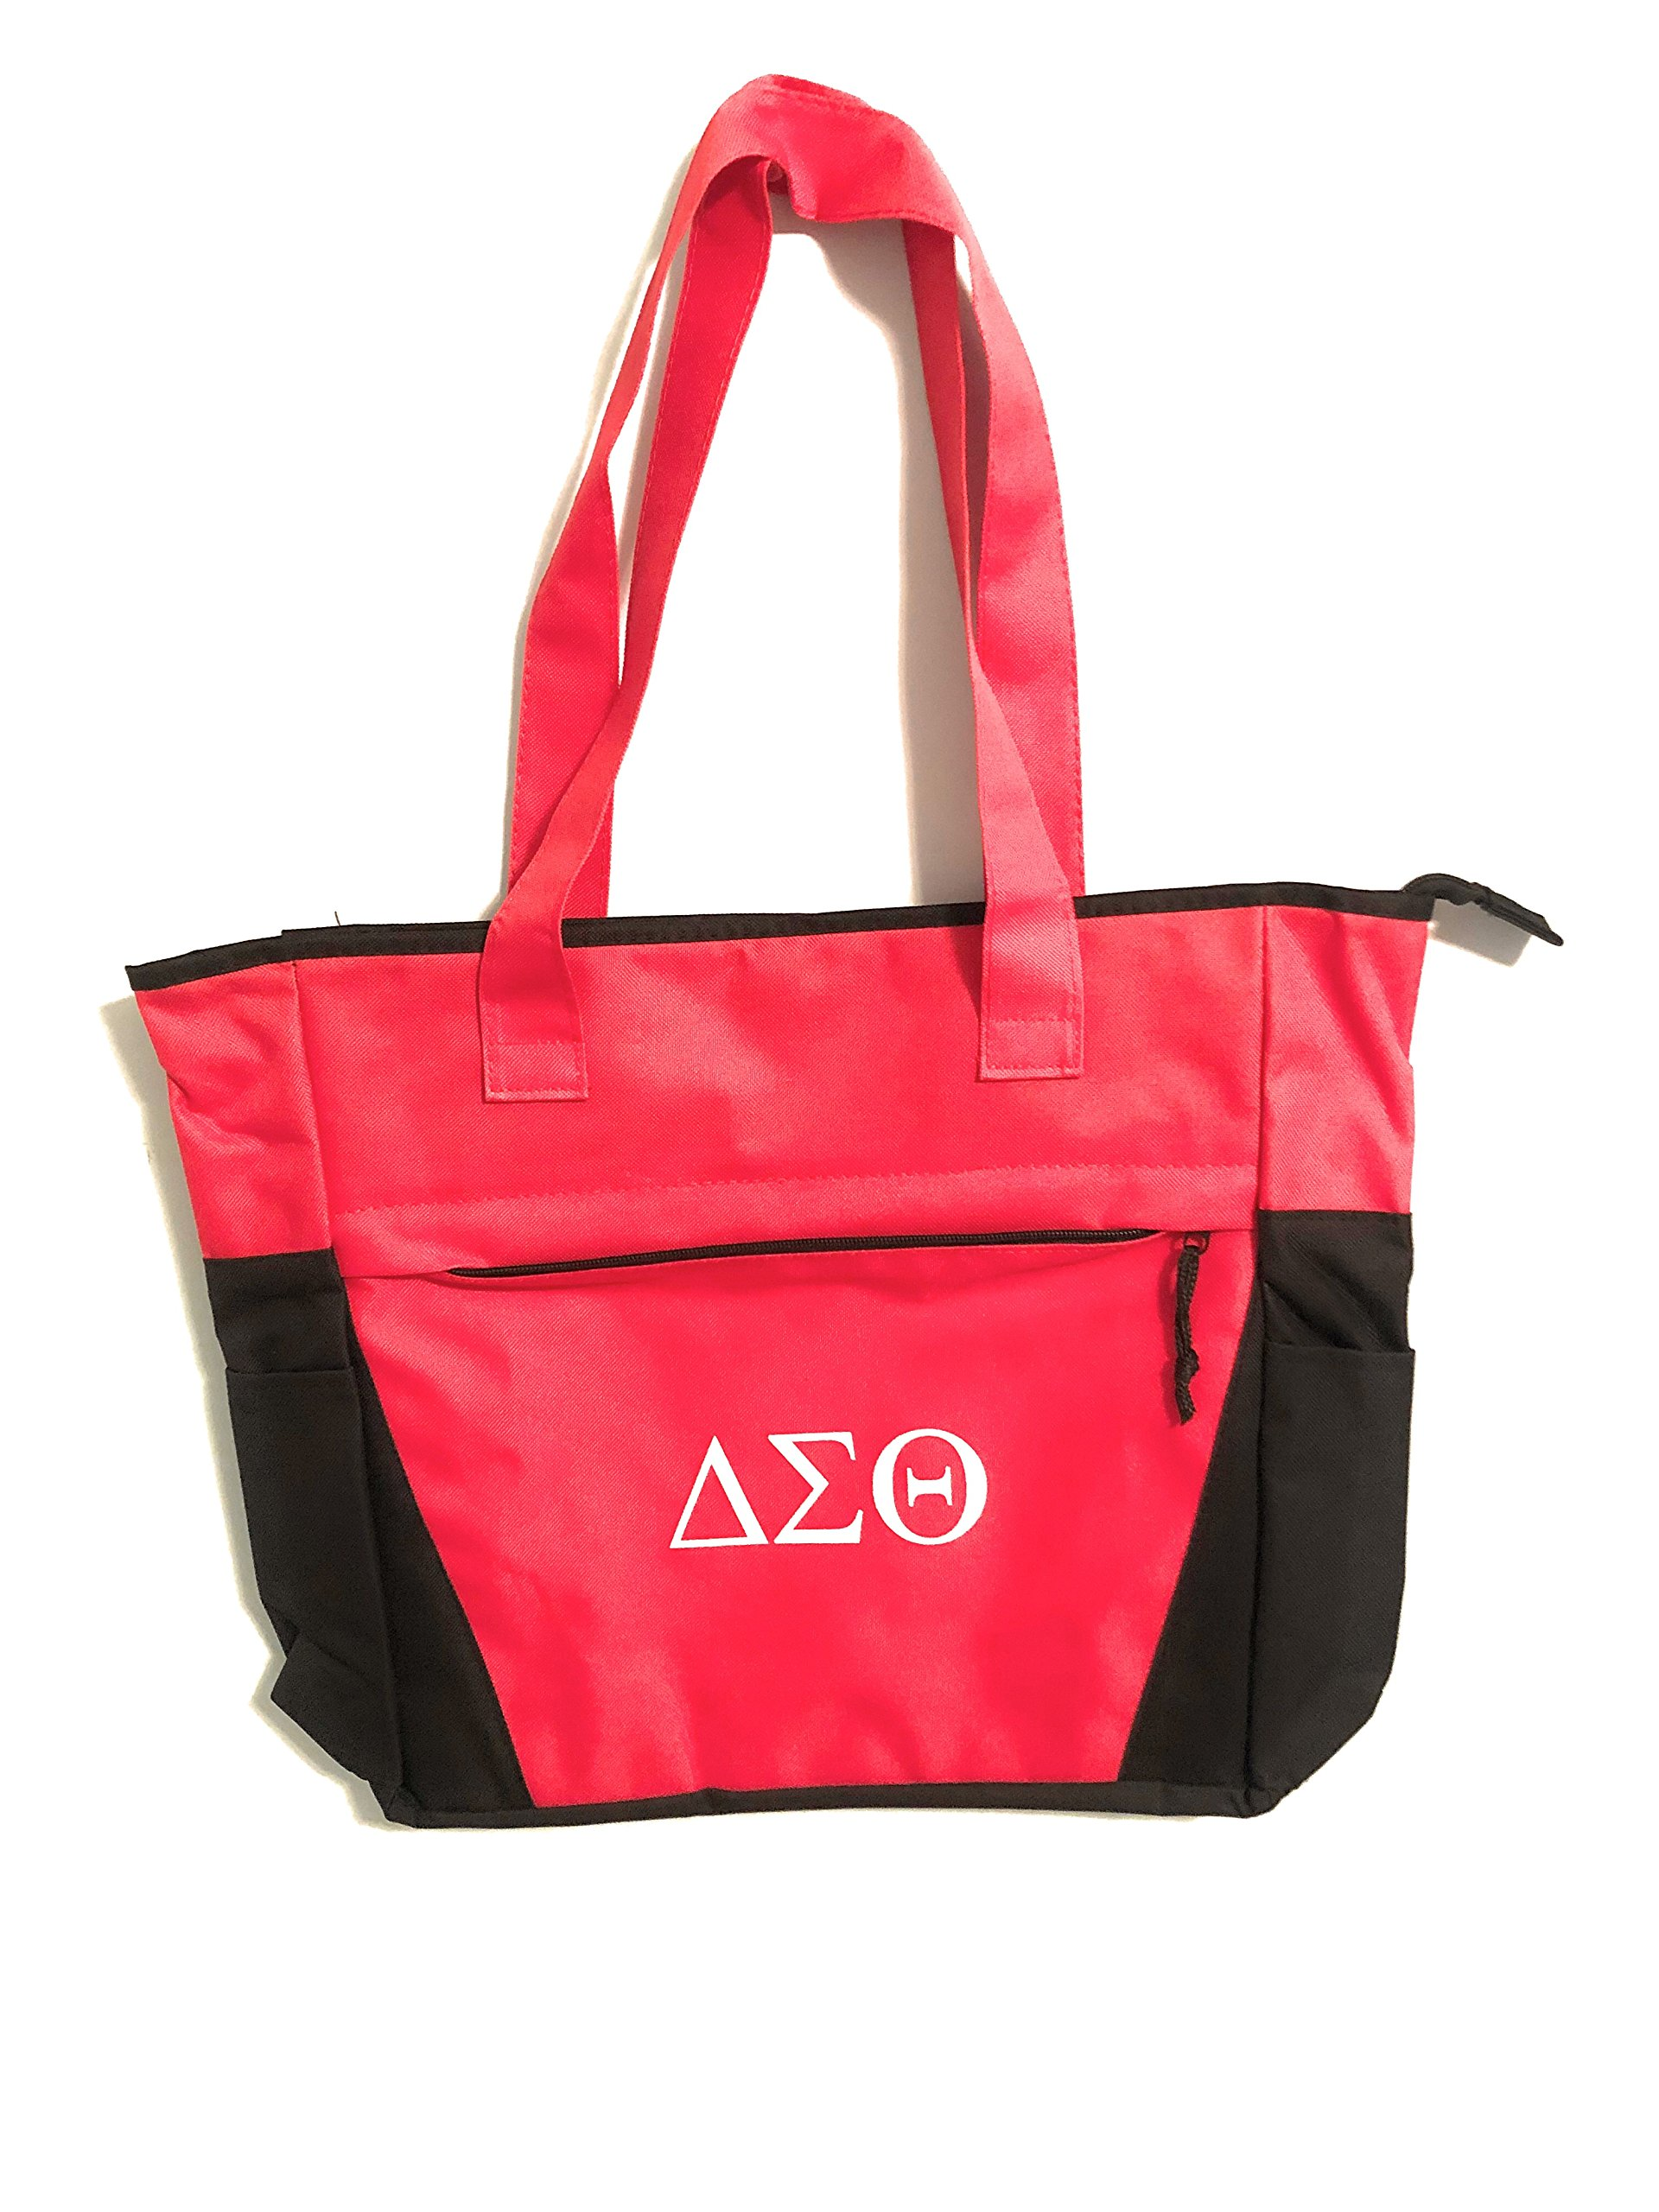 Delta Sigma Theta Sorority Shoulder Tote Bag - Crossing Initiation Graduation Gift Paraphernalia